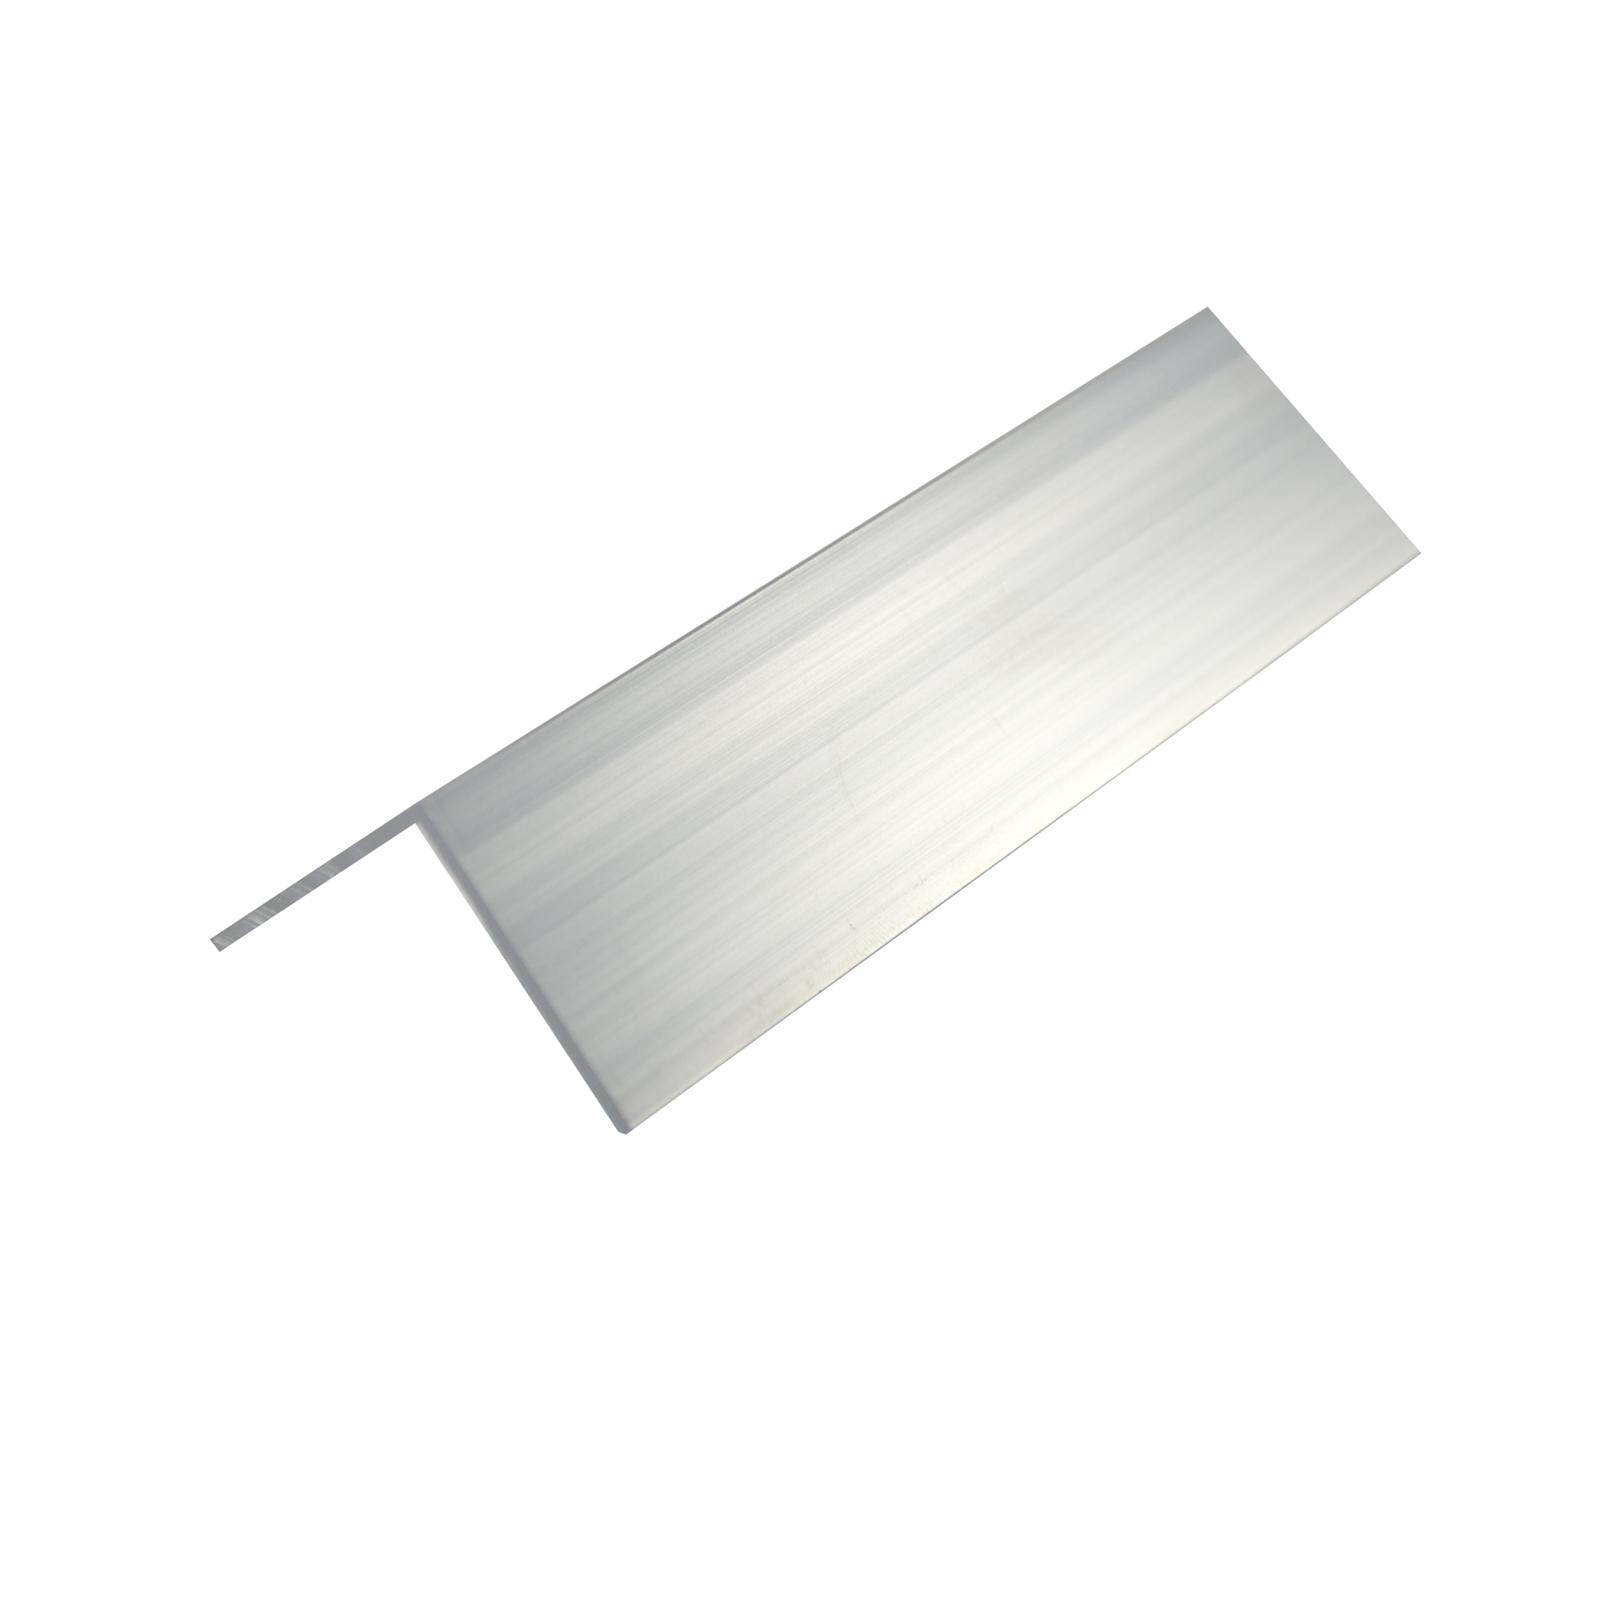 Metal Mate 40 x 40 x 1.4mm 3m Aluminium Equal Angle